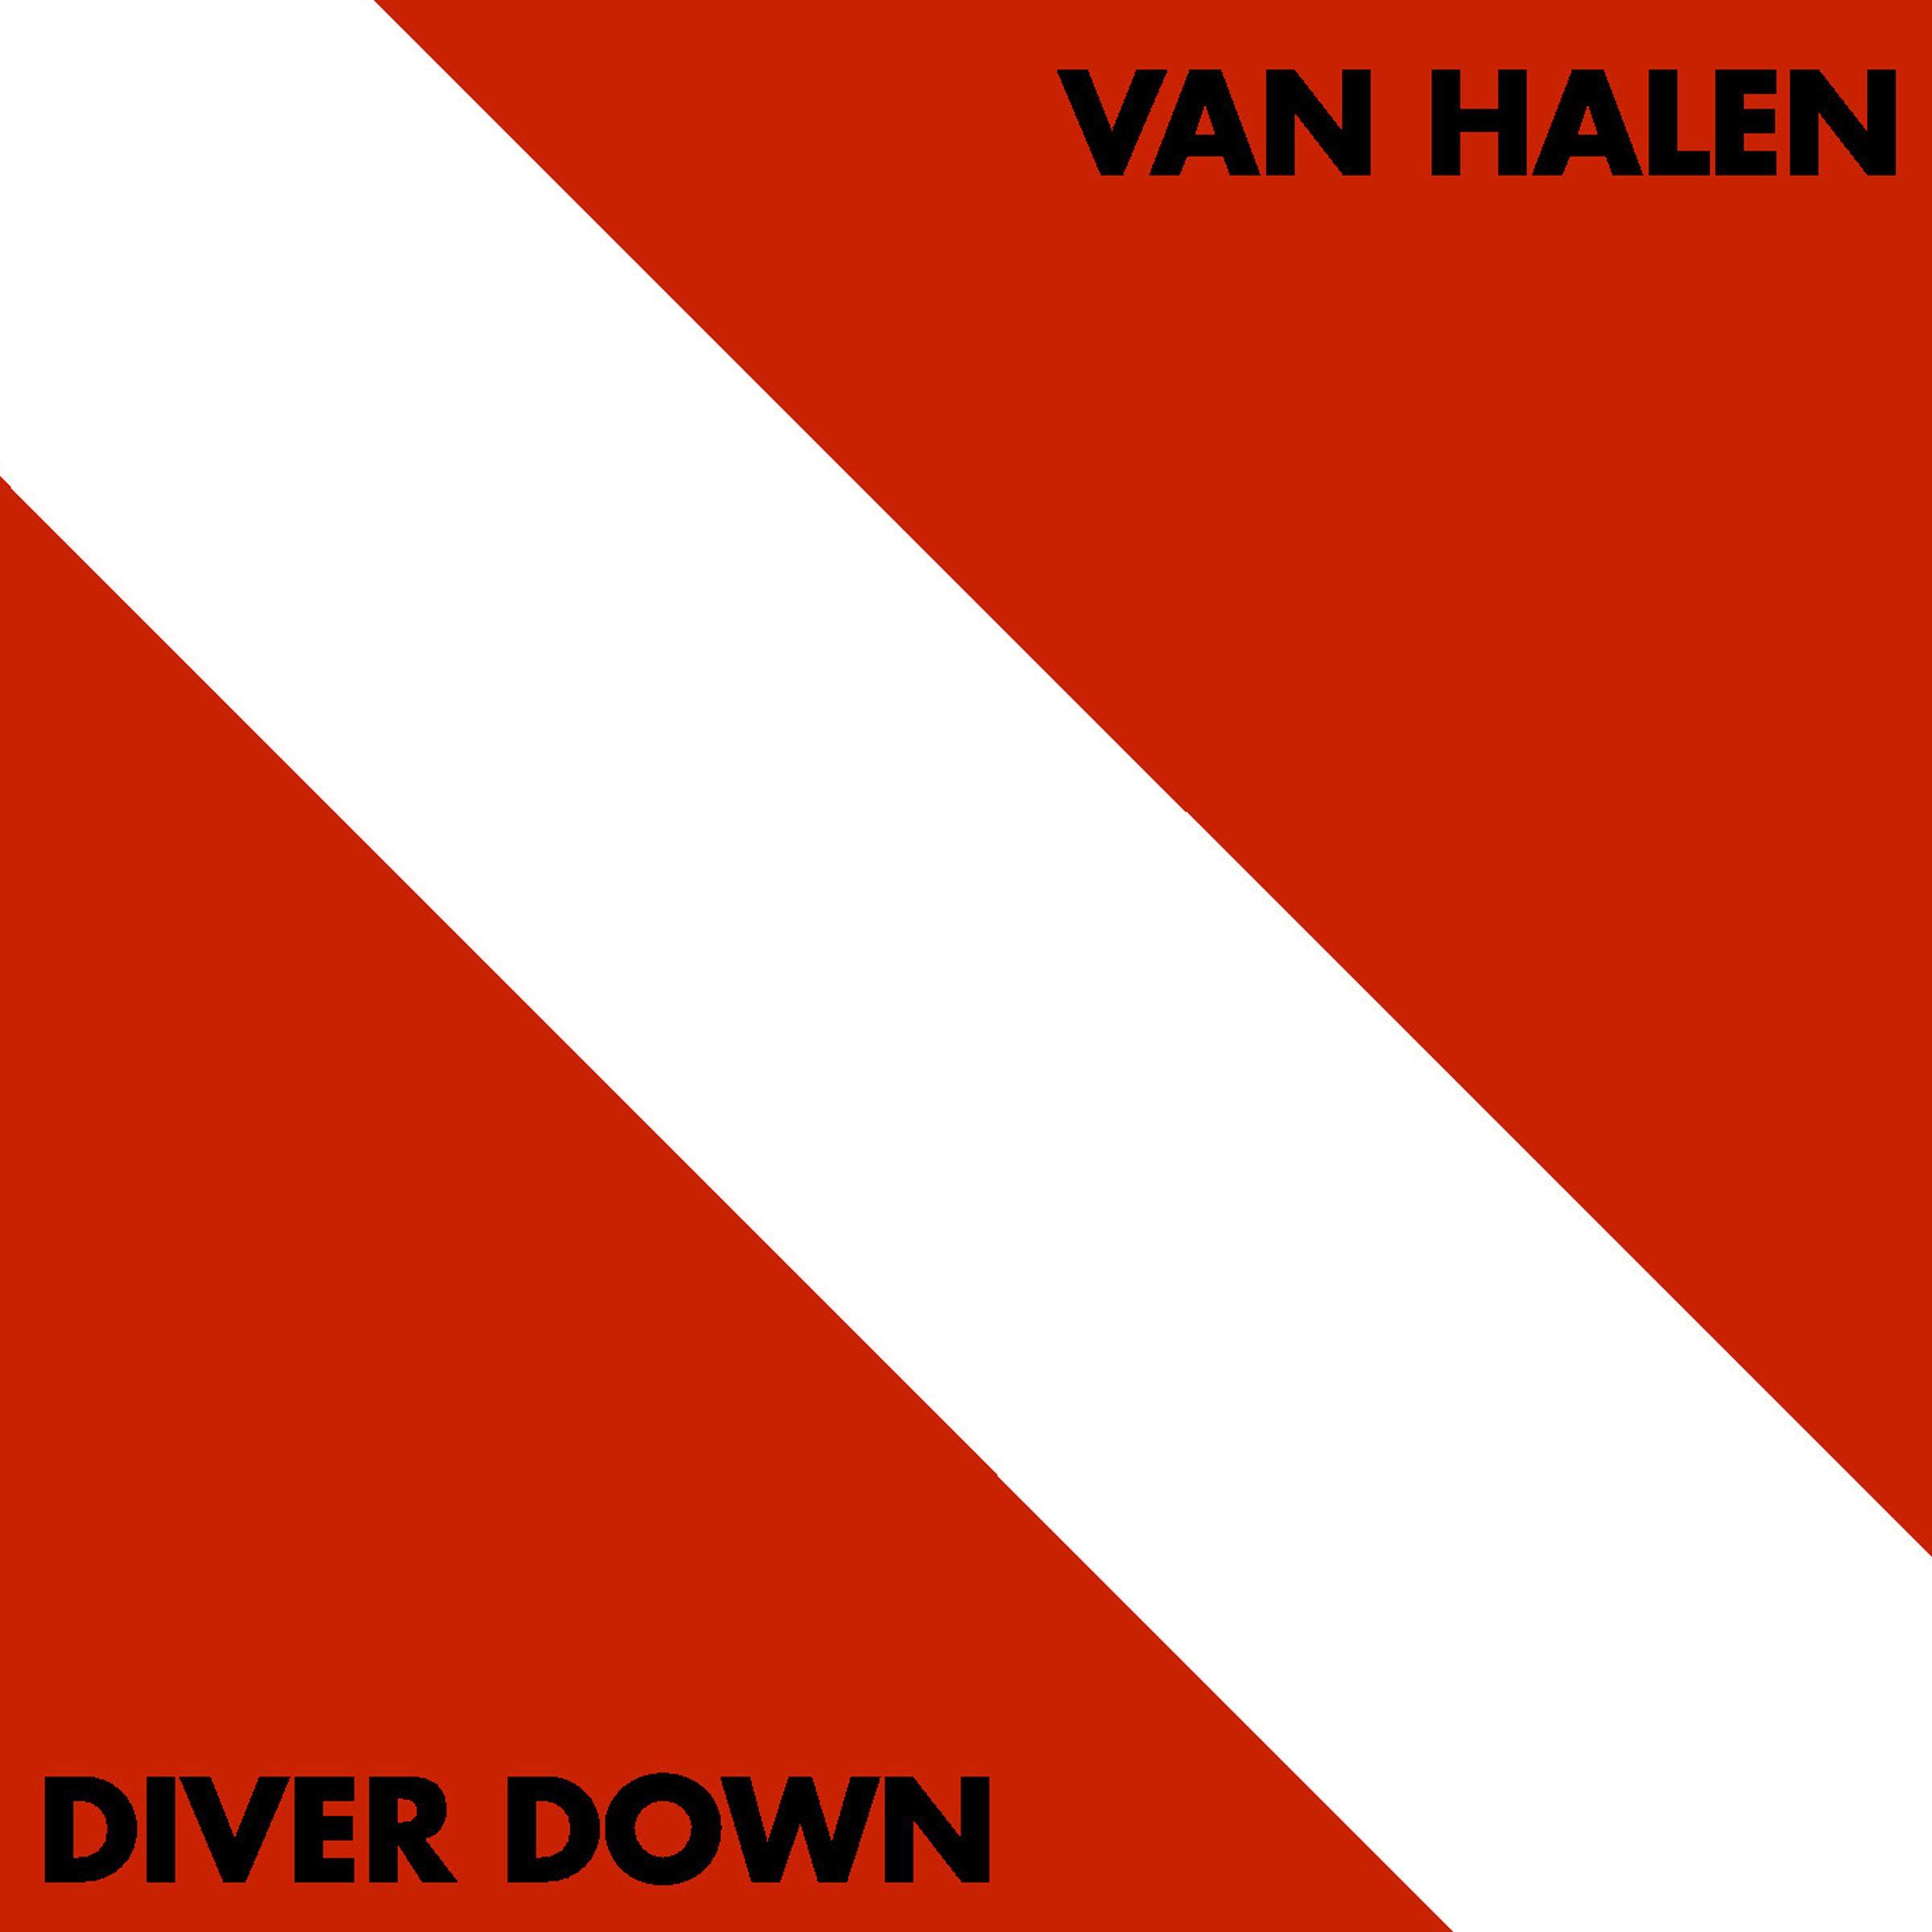 Van Halen (ヴァン・ヘイレン) 5thアルバム『Diver Down (ダイヴァー・ダウン)』(1982年4月14日発売) 高画質CDジャケット画像 (ジャケ写)